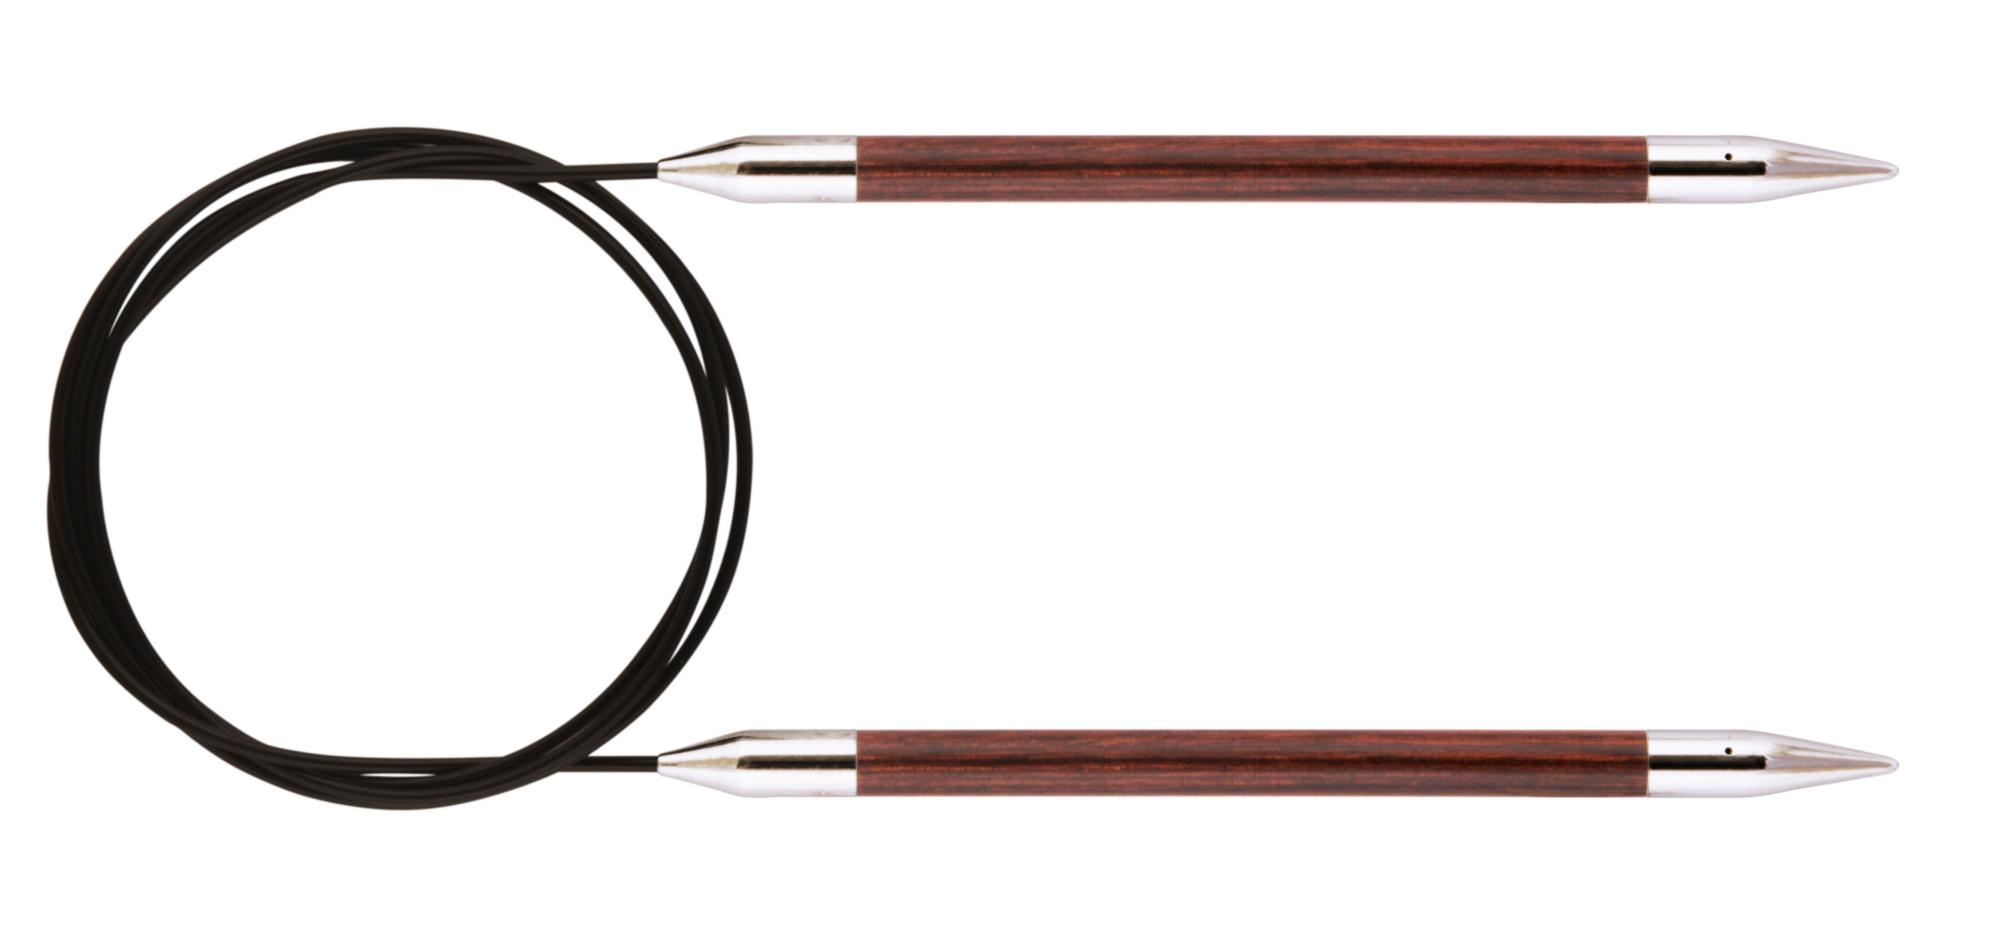 Спицы круговые 80 см Royale KnitPro, 29101, 7.00 мм